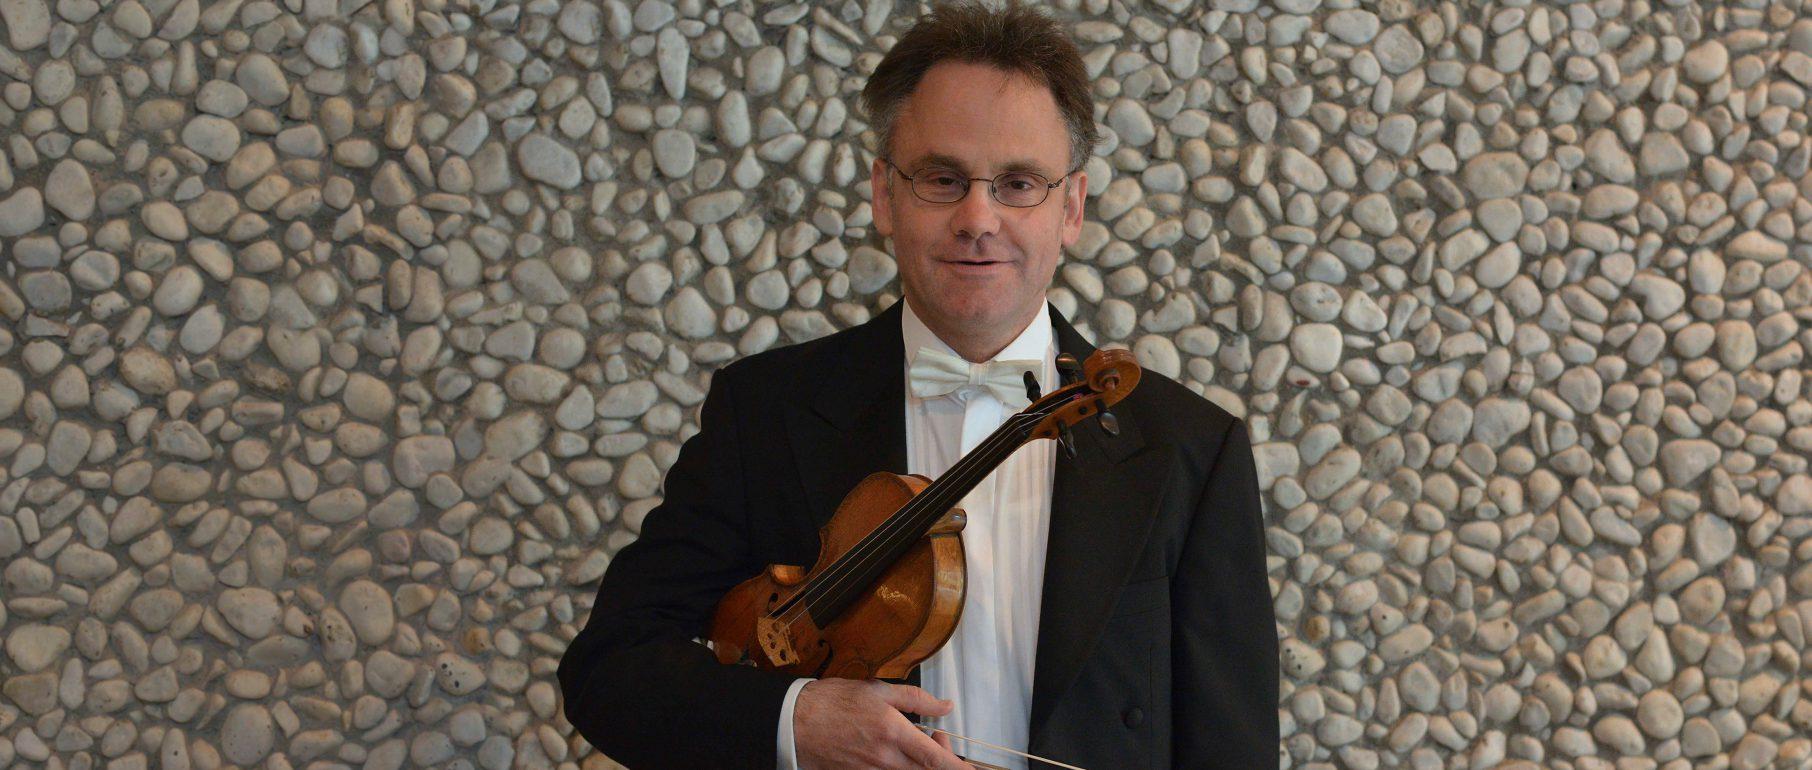 Michael Ewers, 1. Violine (Konzertmeister)